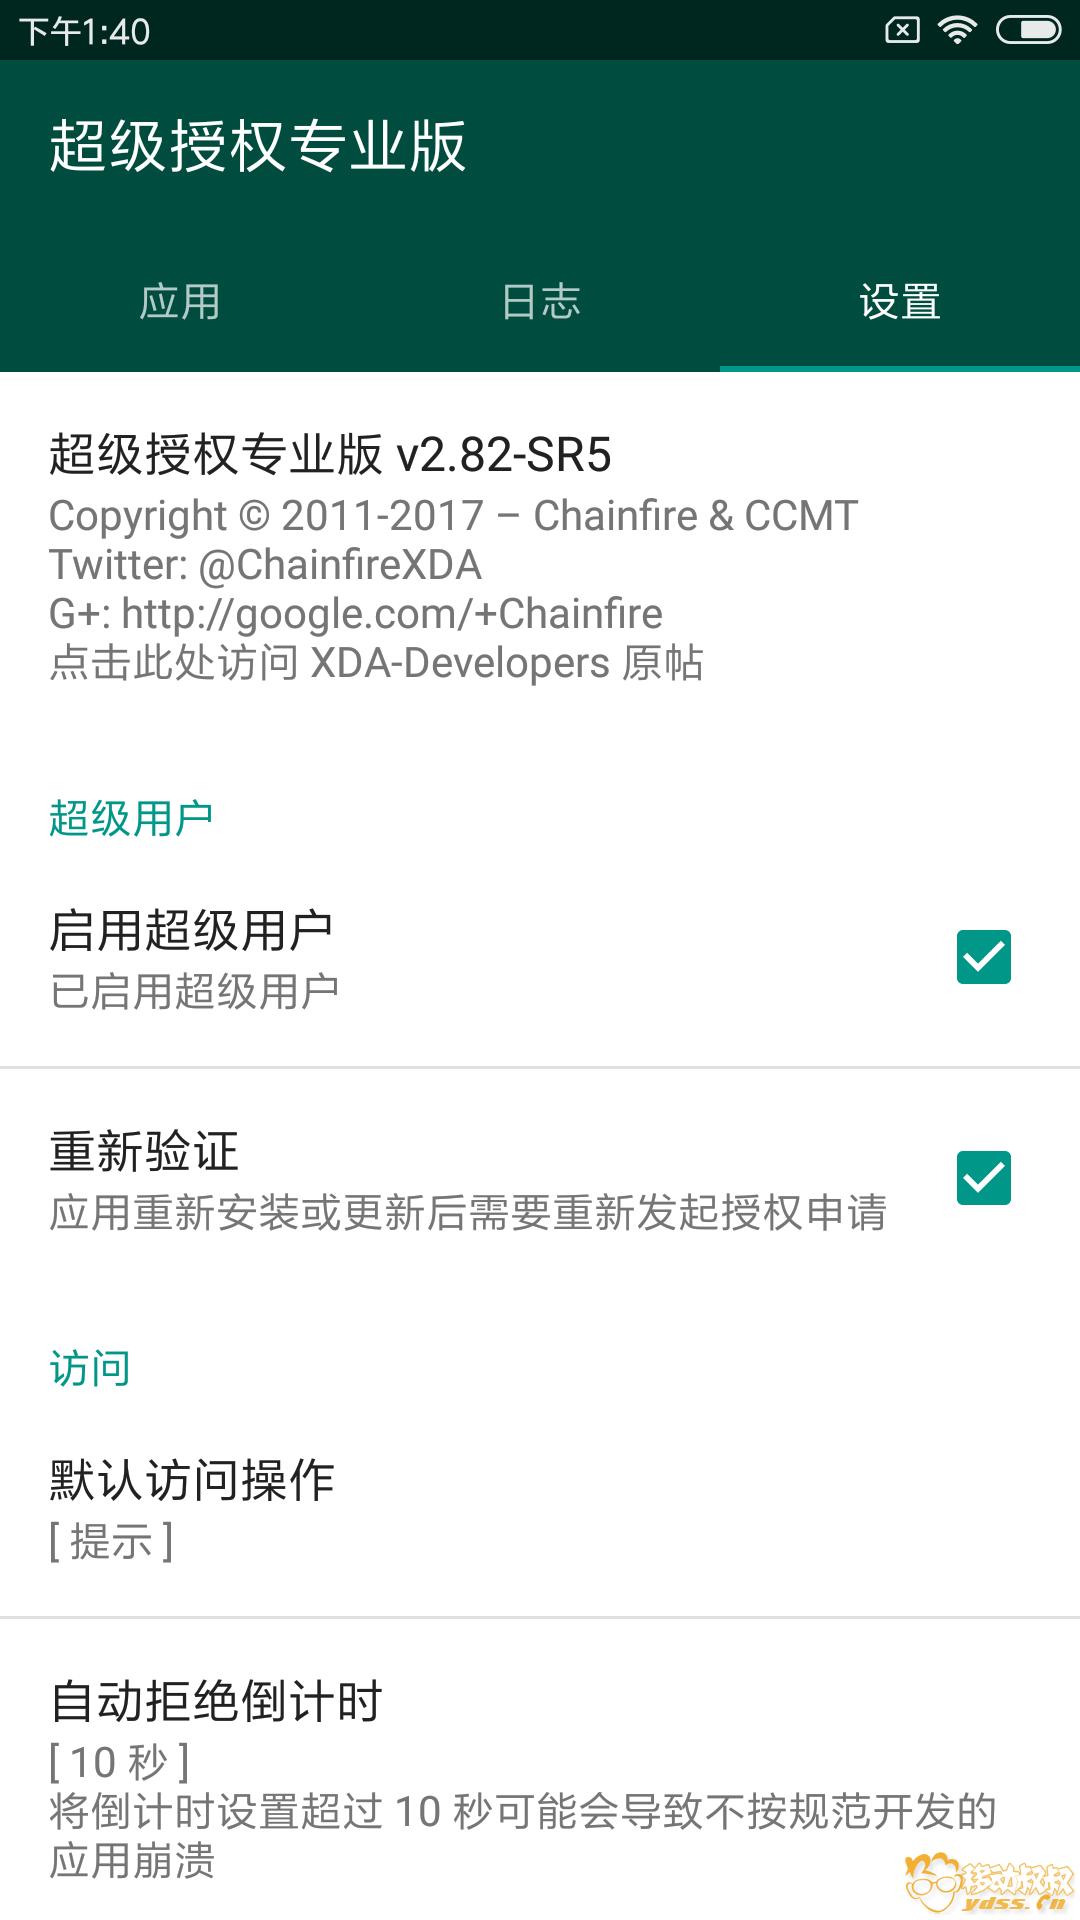 Screenshot_2018-09-23-13-40-34-592_eu.chainfire.supersu.png